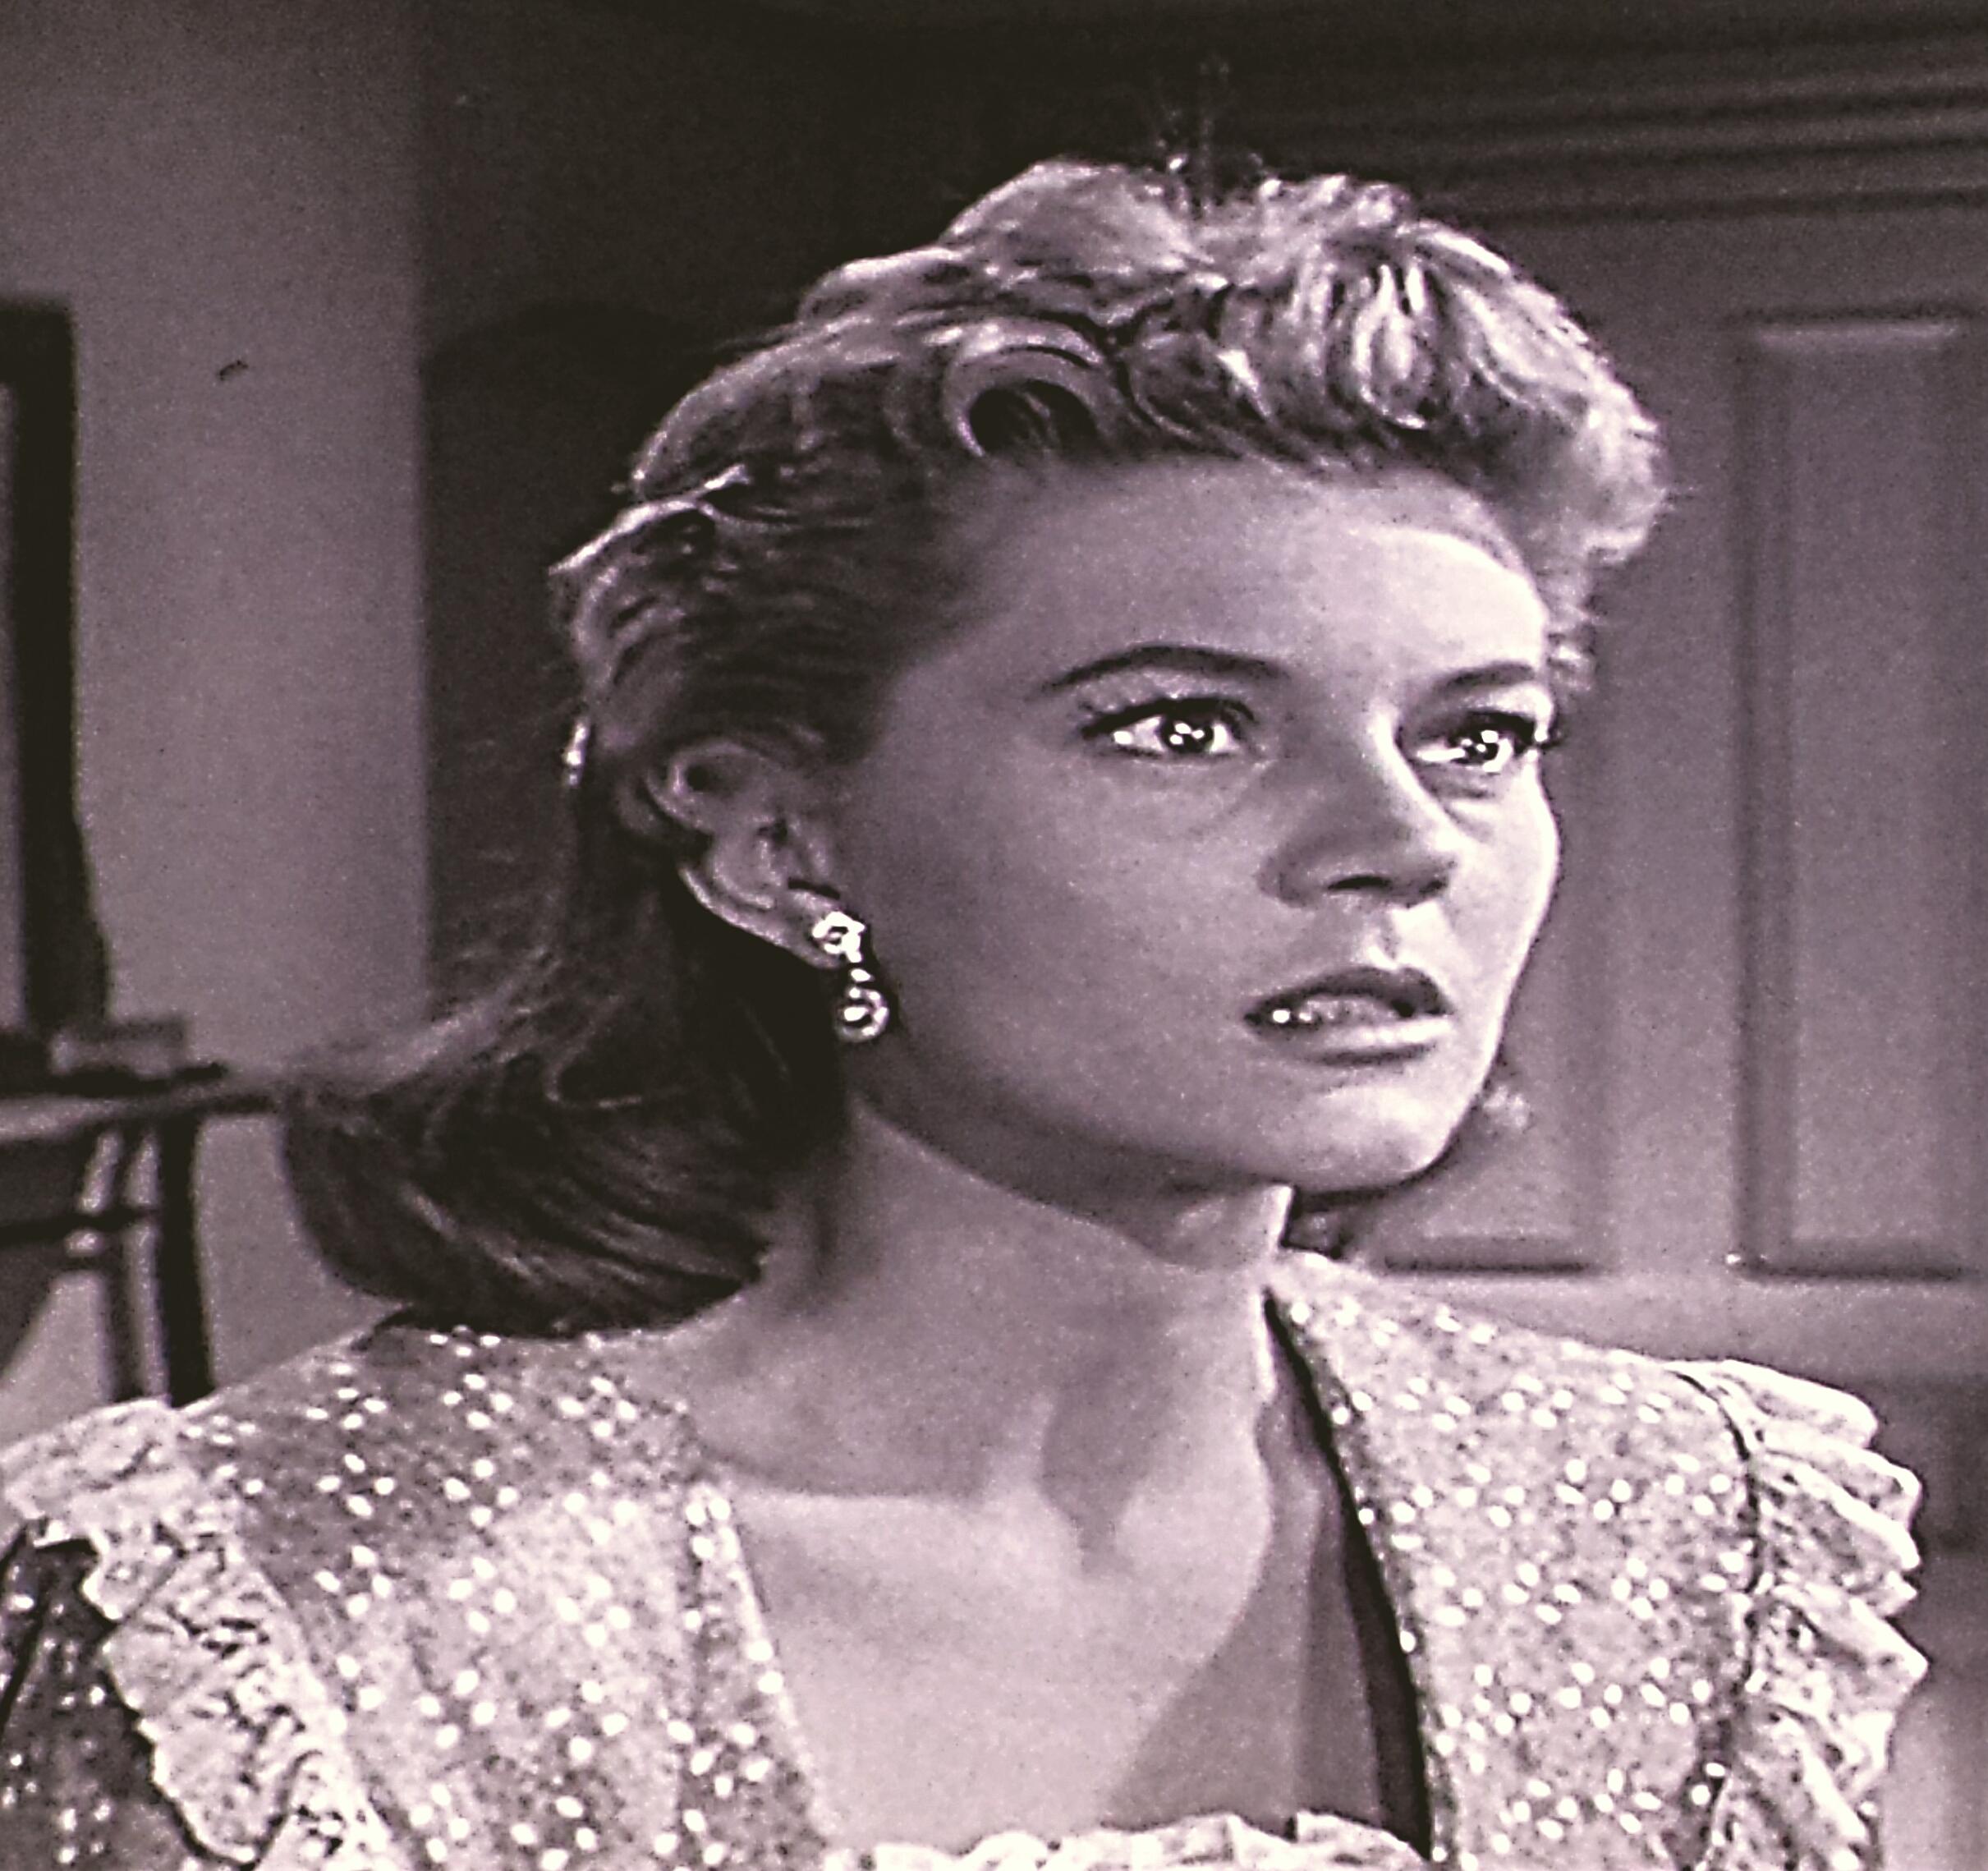 Peggie Castle in Cheyenne (1955)